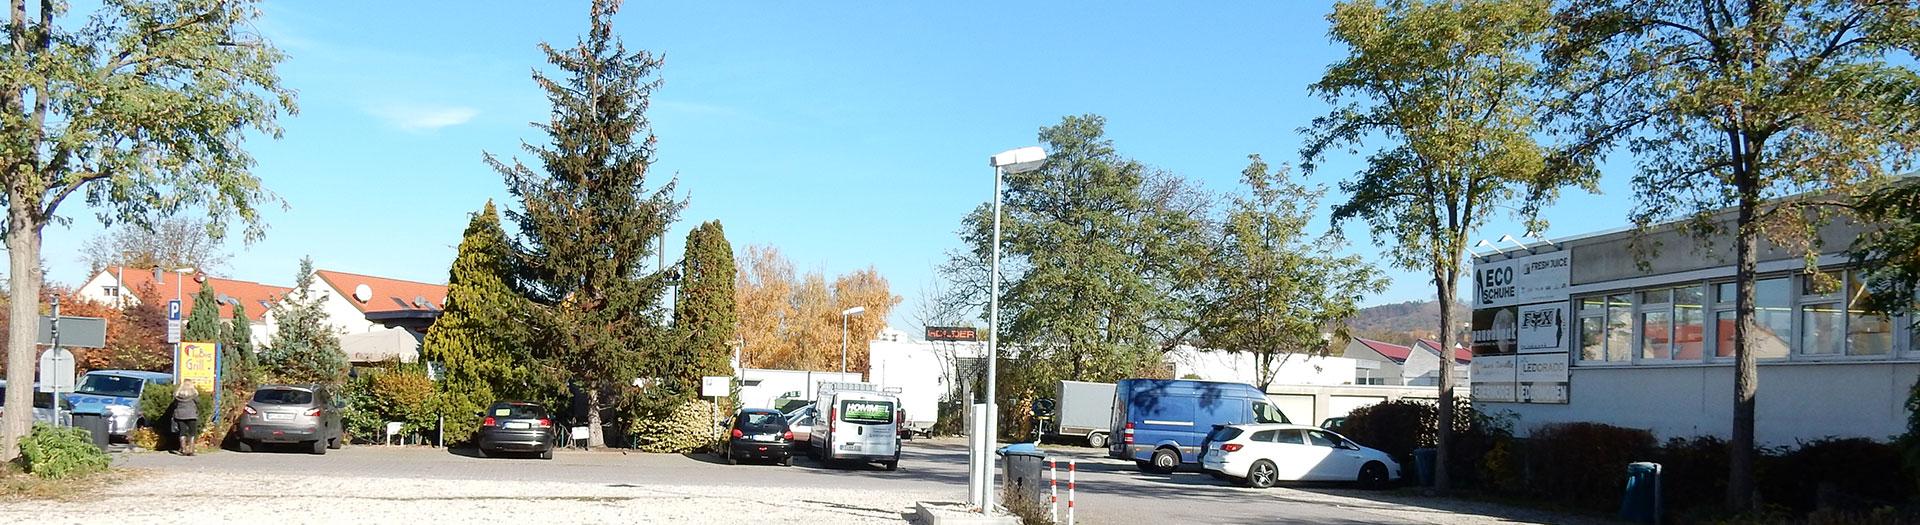 outlet-center-stuttgarter-str60-60-seite-nuertinger-str-parkplatz1